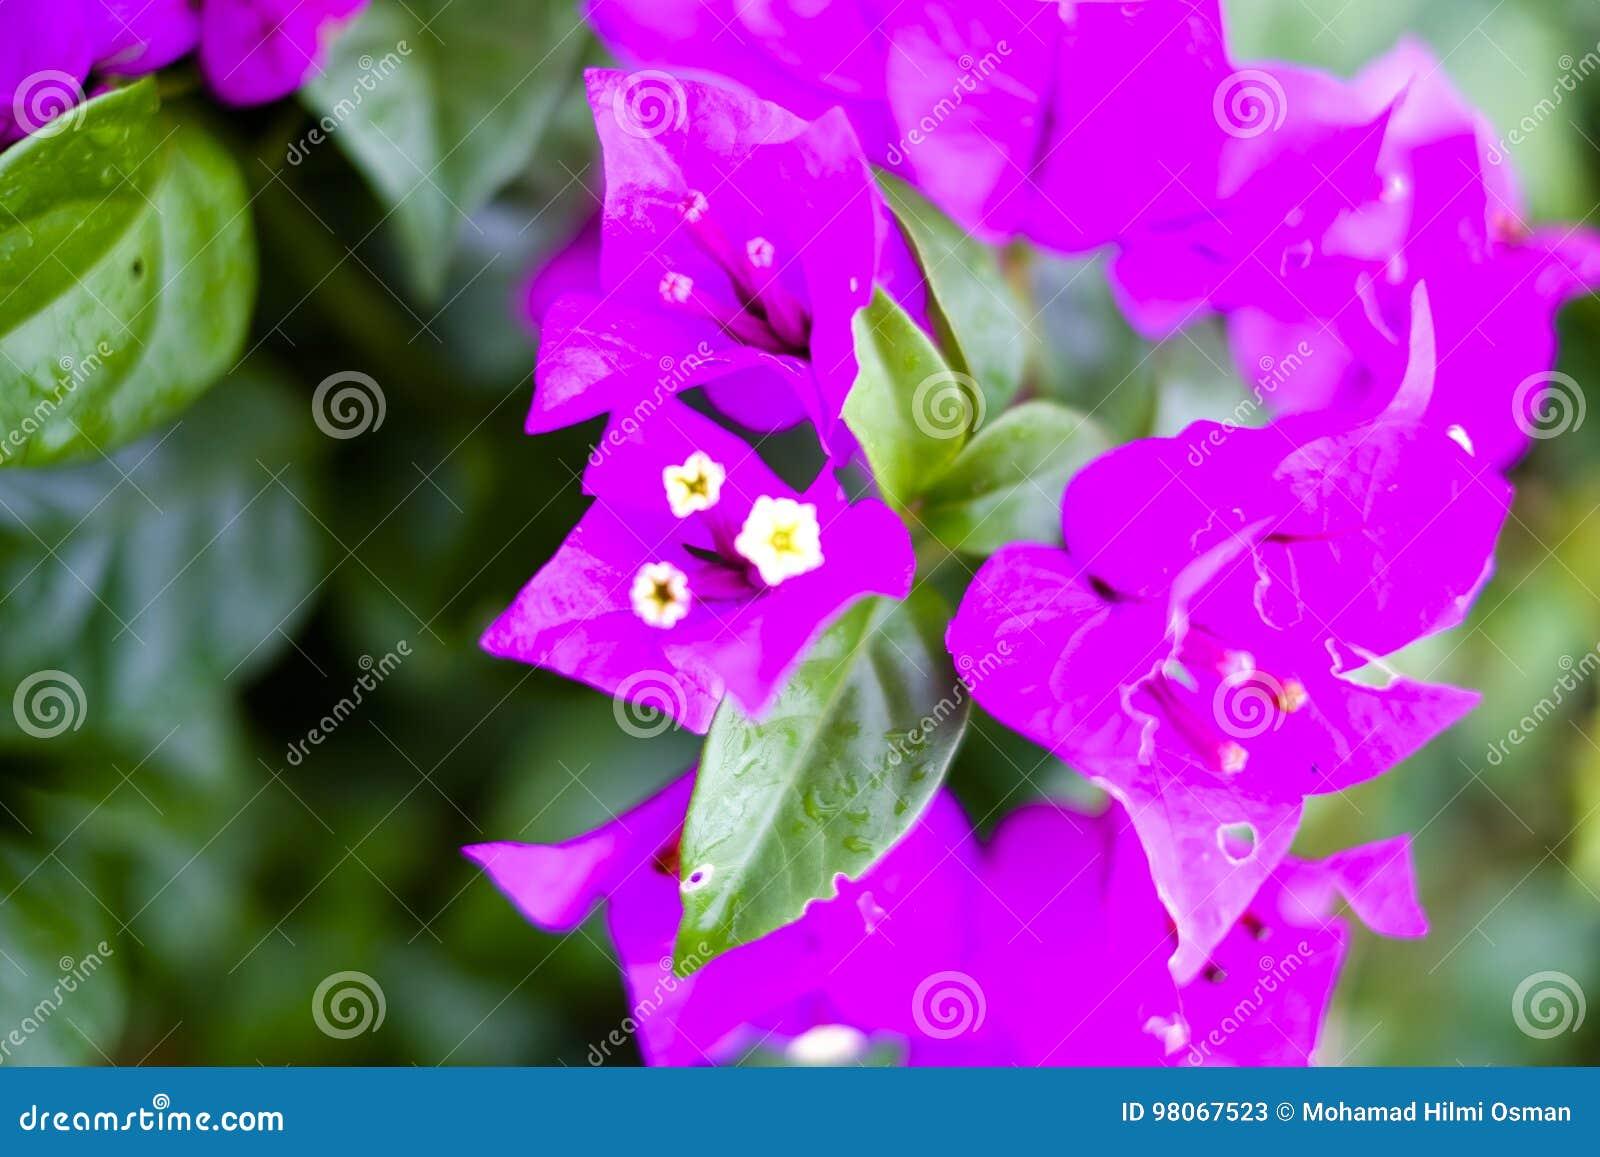 Beutiful flower in malaysia stock image image of world water download beutiful flower in malaysia stock image image of world water 98067523 izmirmasajfo